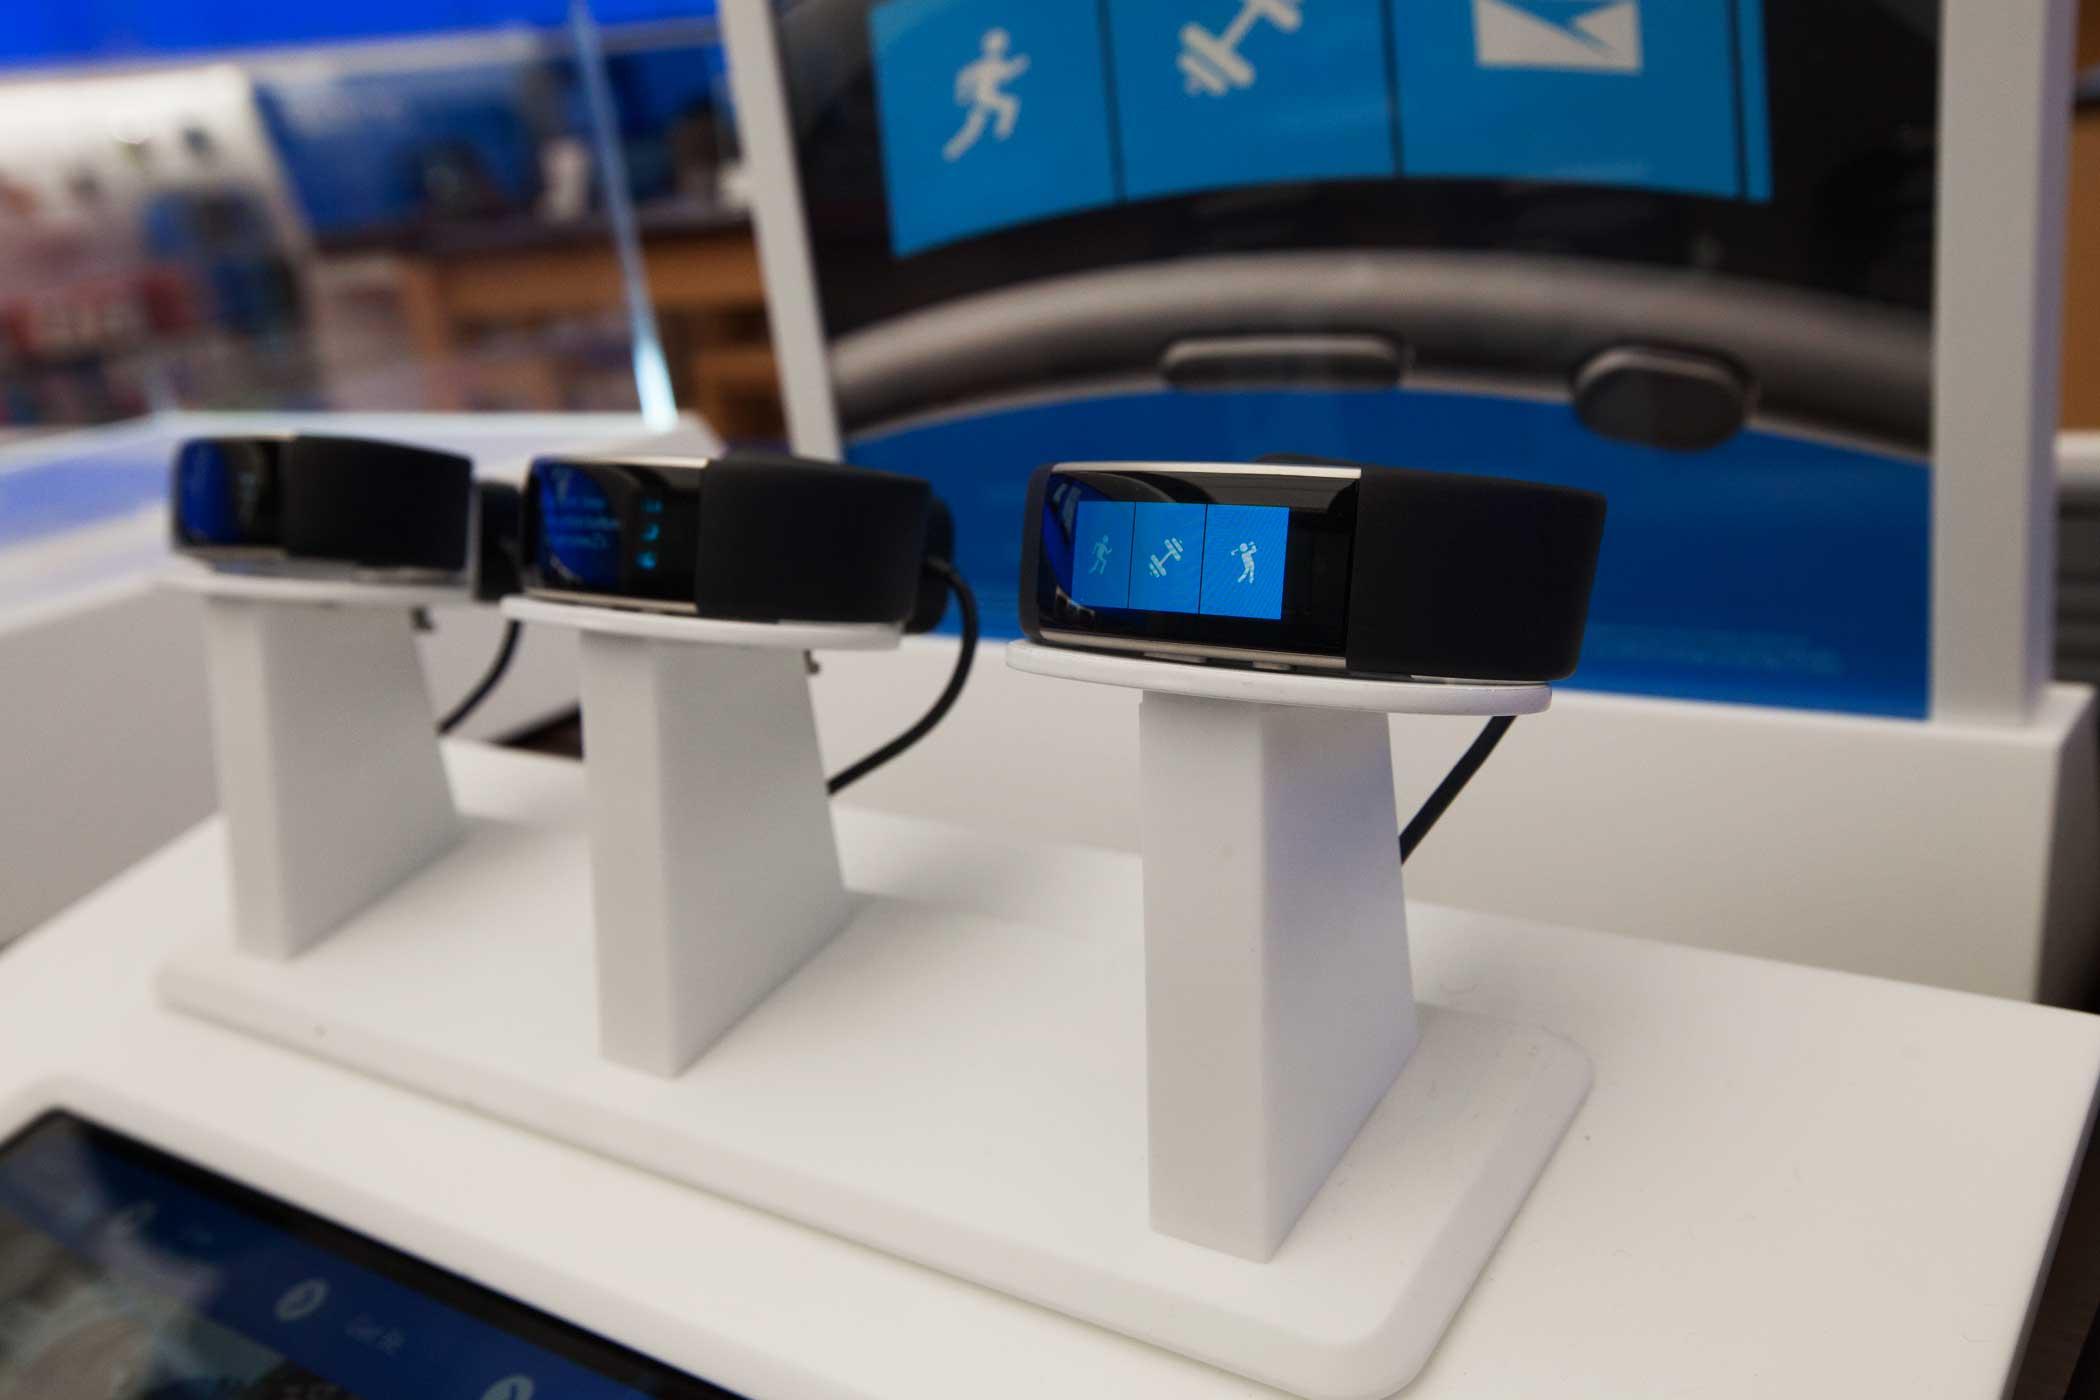 <b>Microsoft Store</b> Fitbit watches.